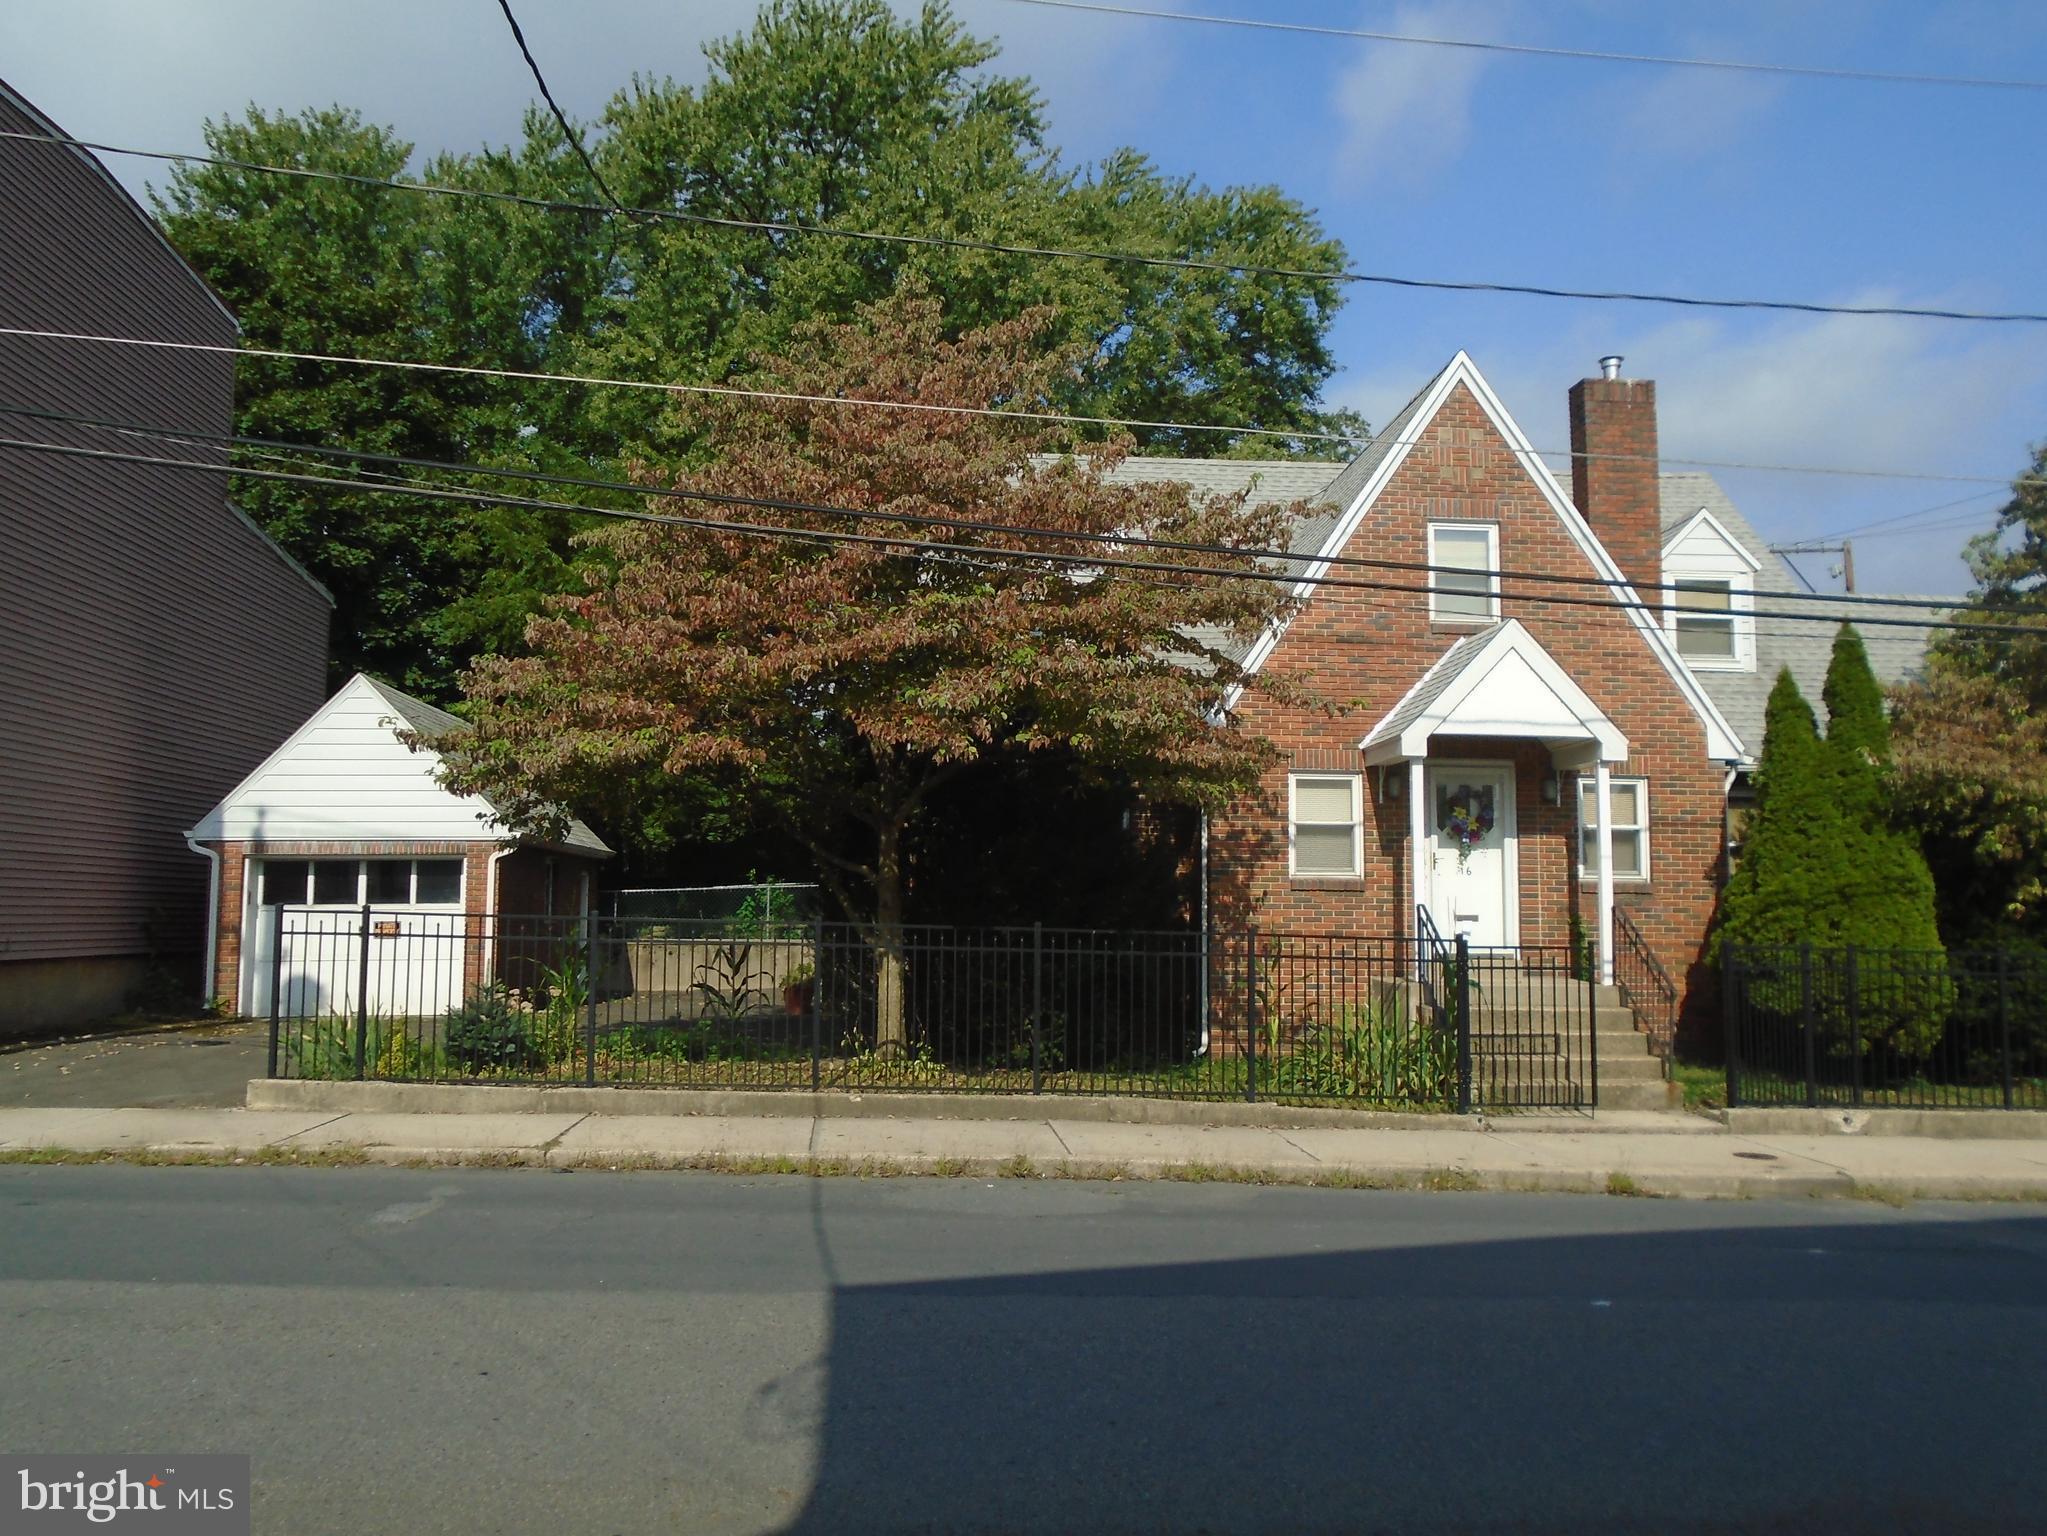 16 N FOURTH STREET, MINERSVILLE, PA 17954